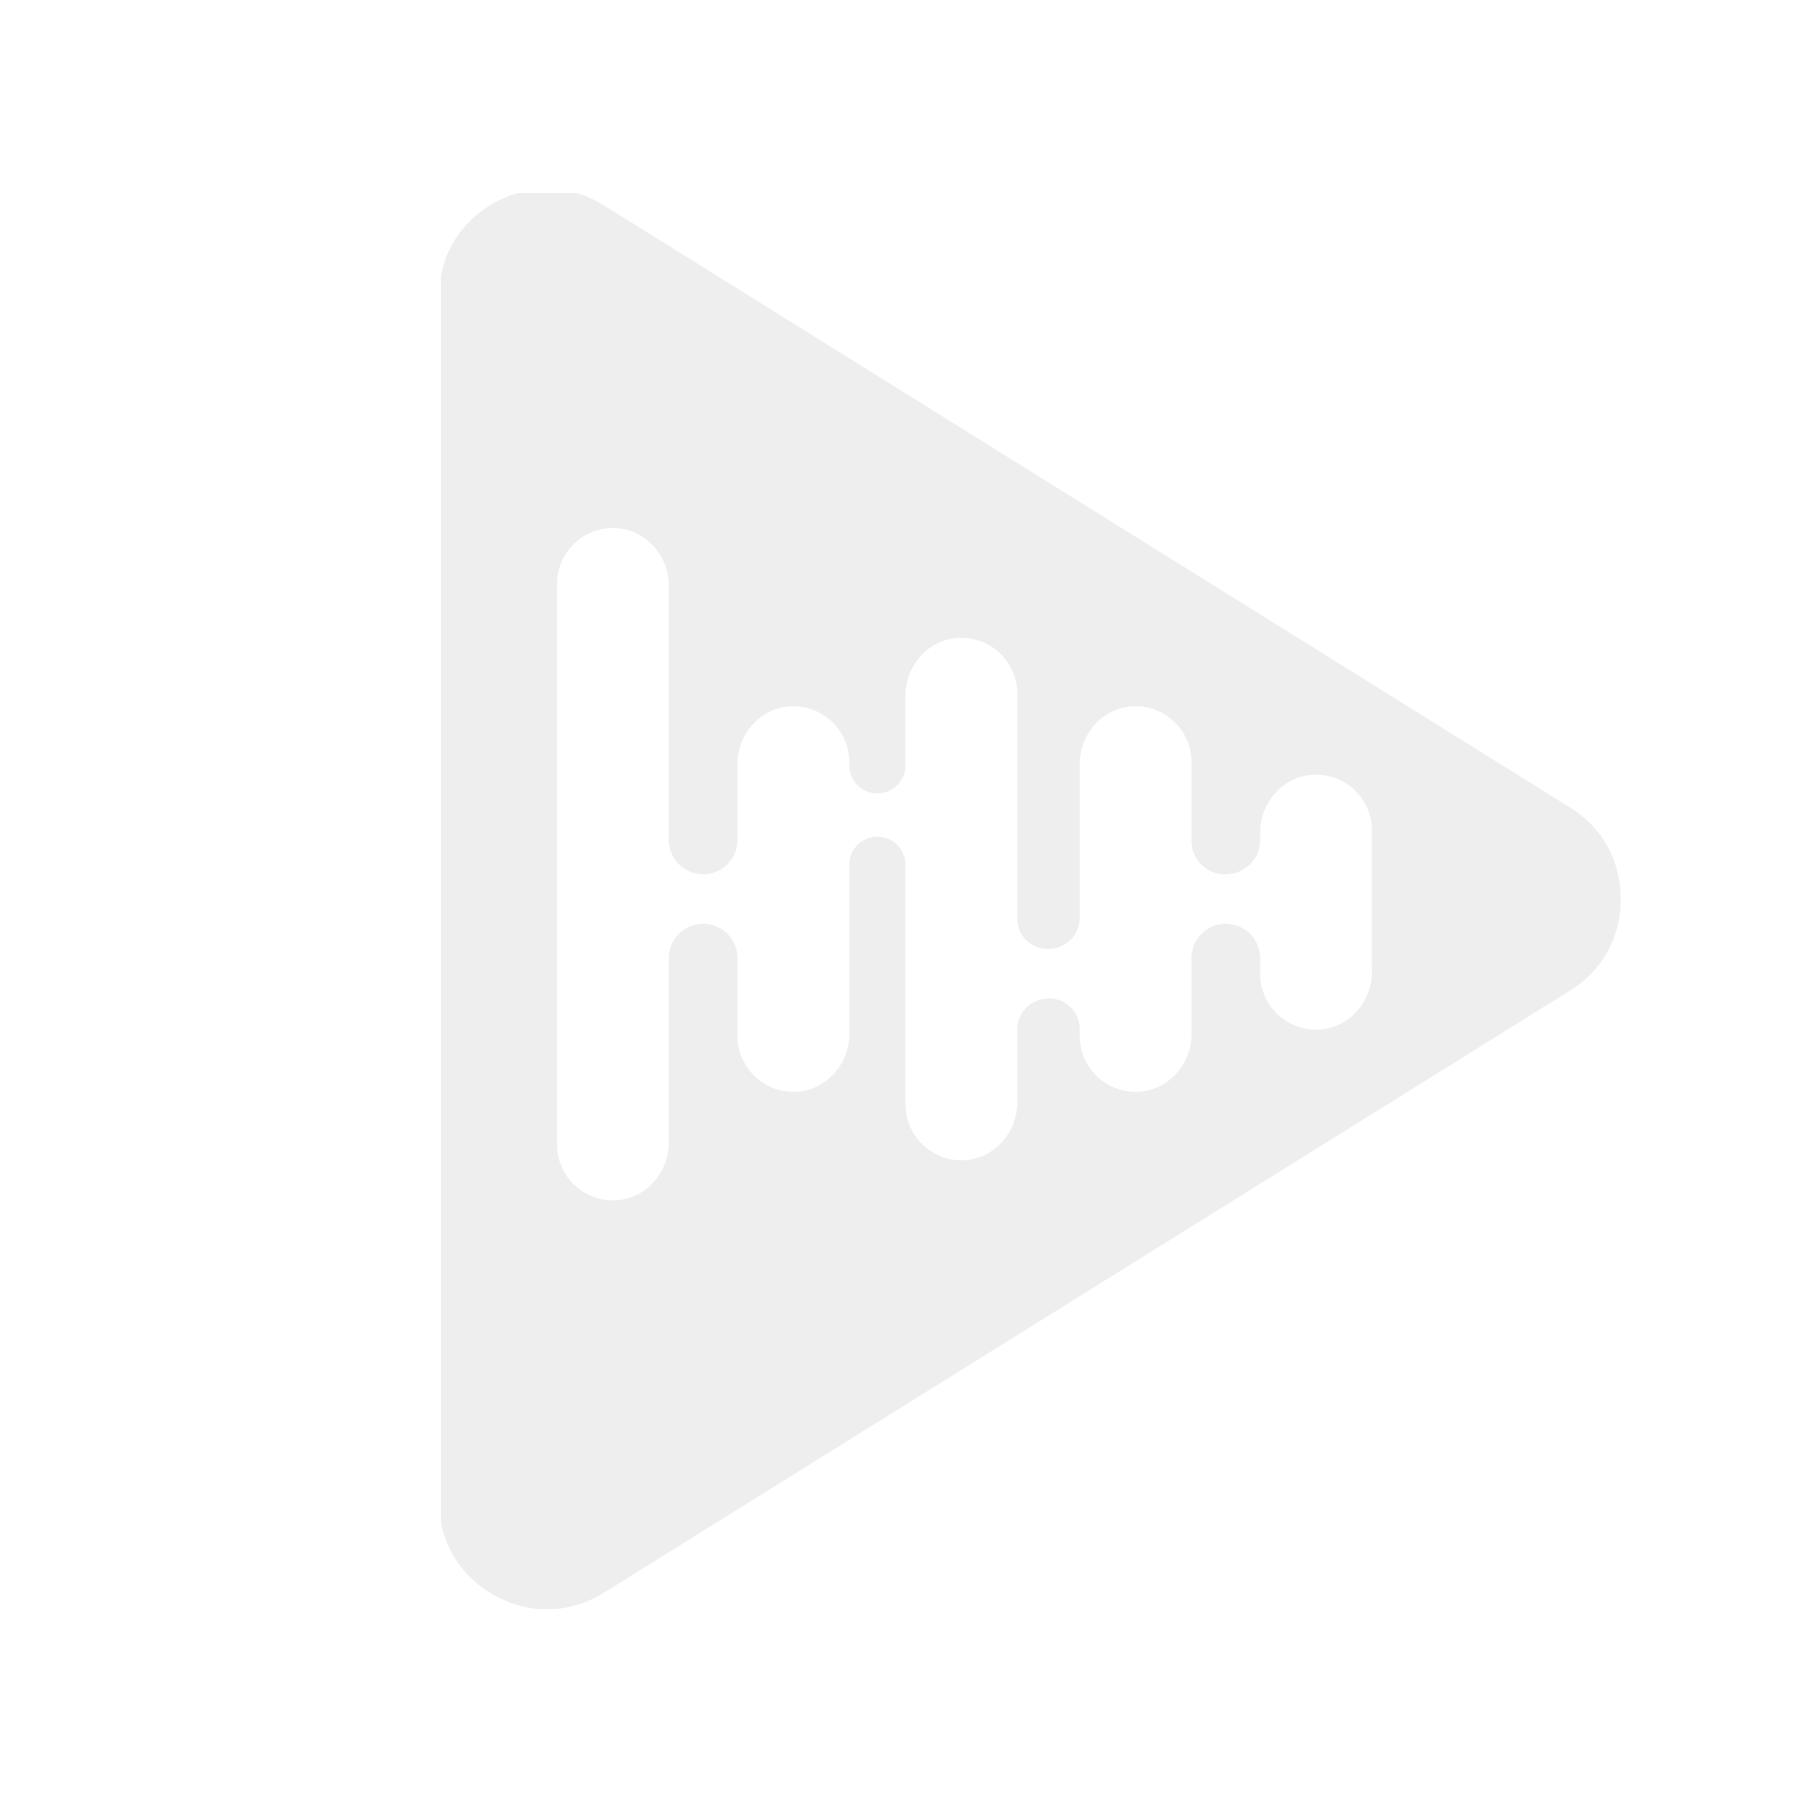 Speedsignal B-3444721-2